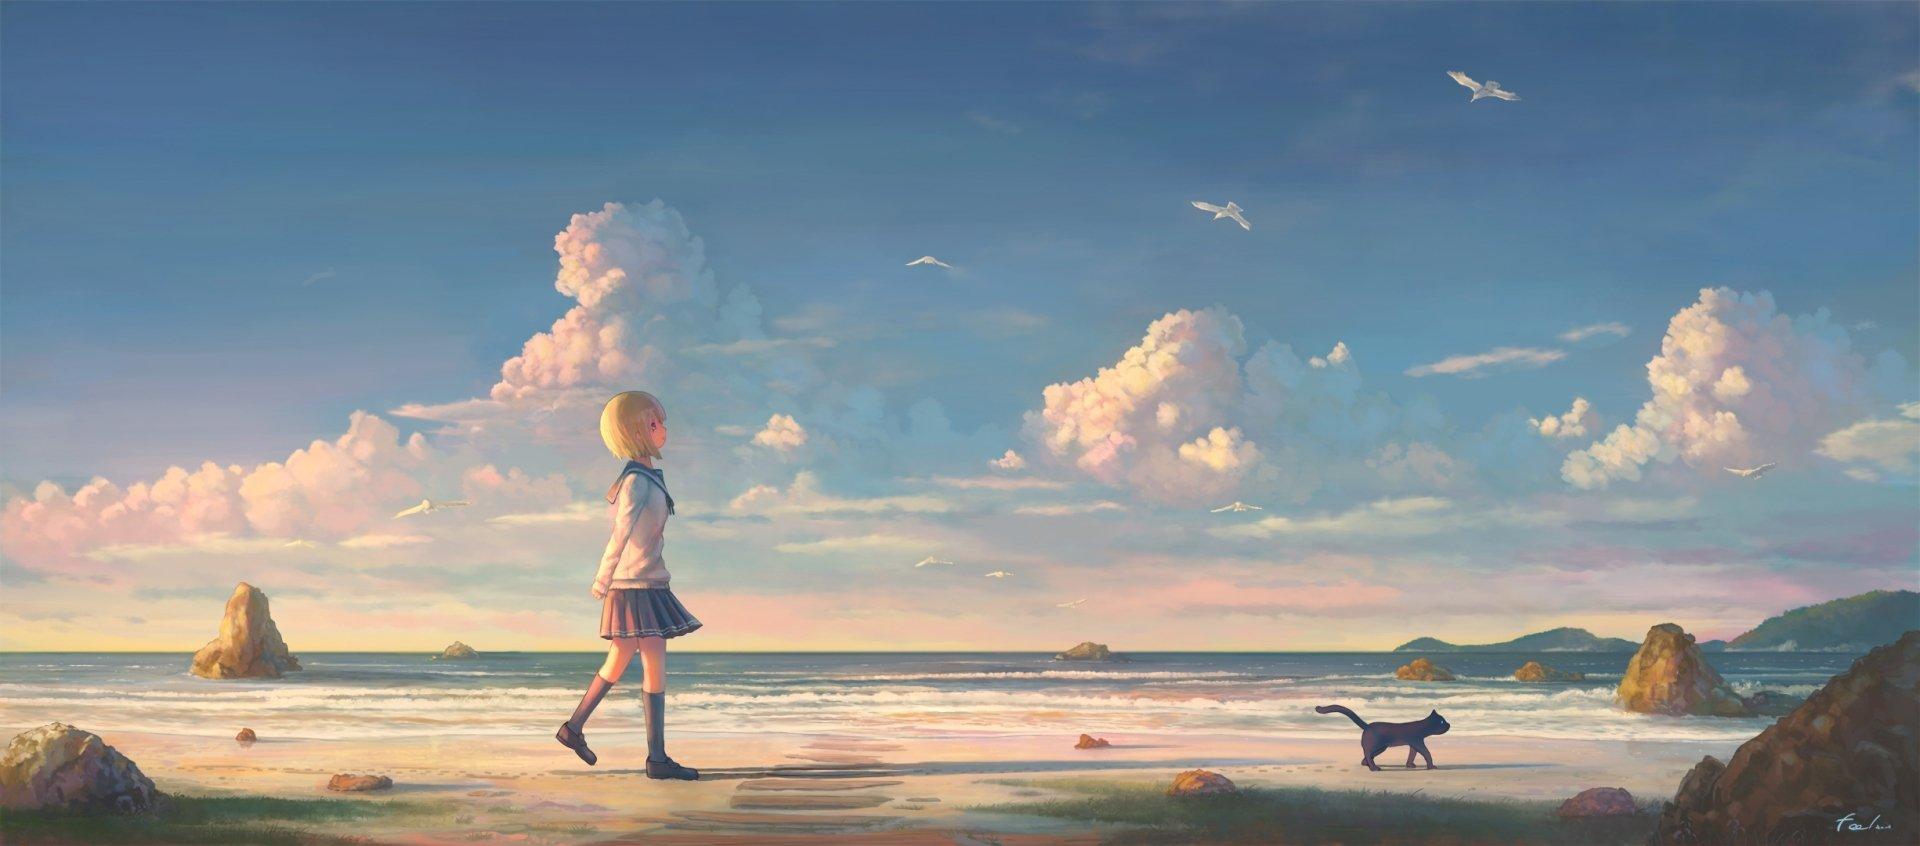 Anime Girls Beach Wallpaper HD 4k